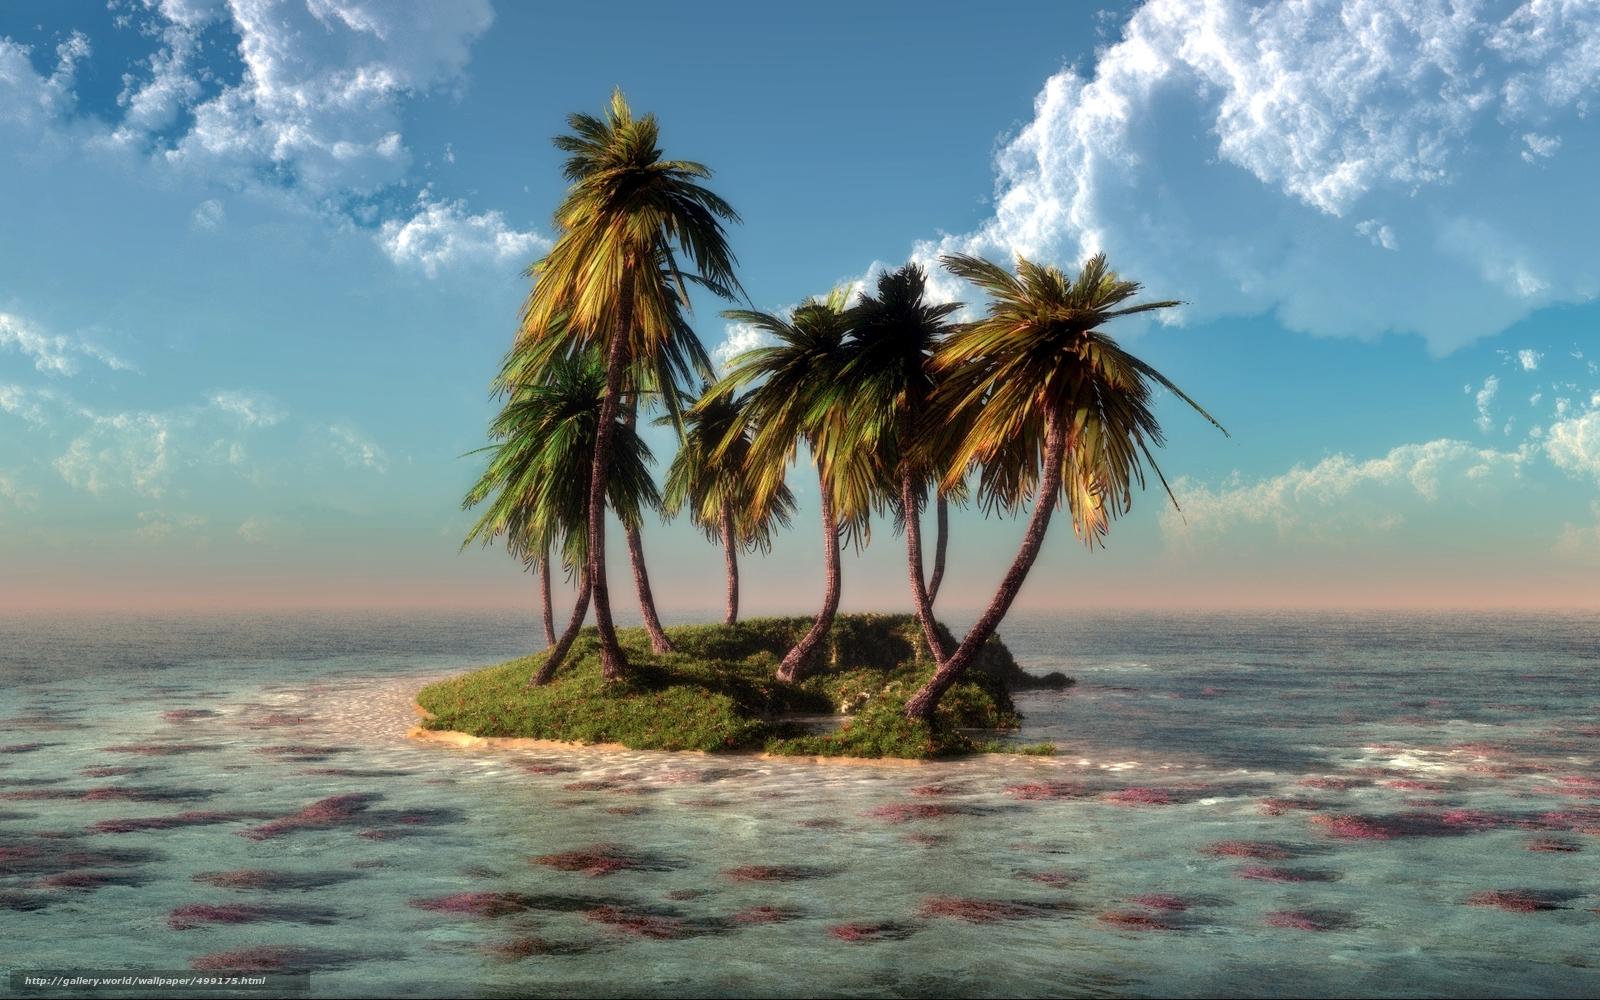 Download Wallpaper Haiti Klontak Landscape Free Desktop In The Resolution 1920x1200 Picture No499175